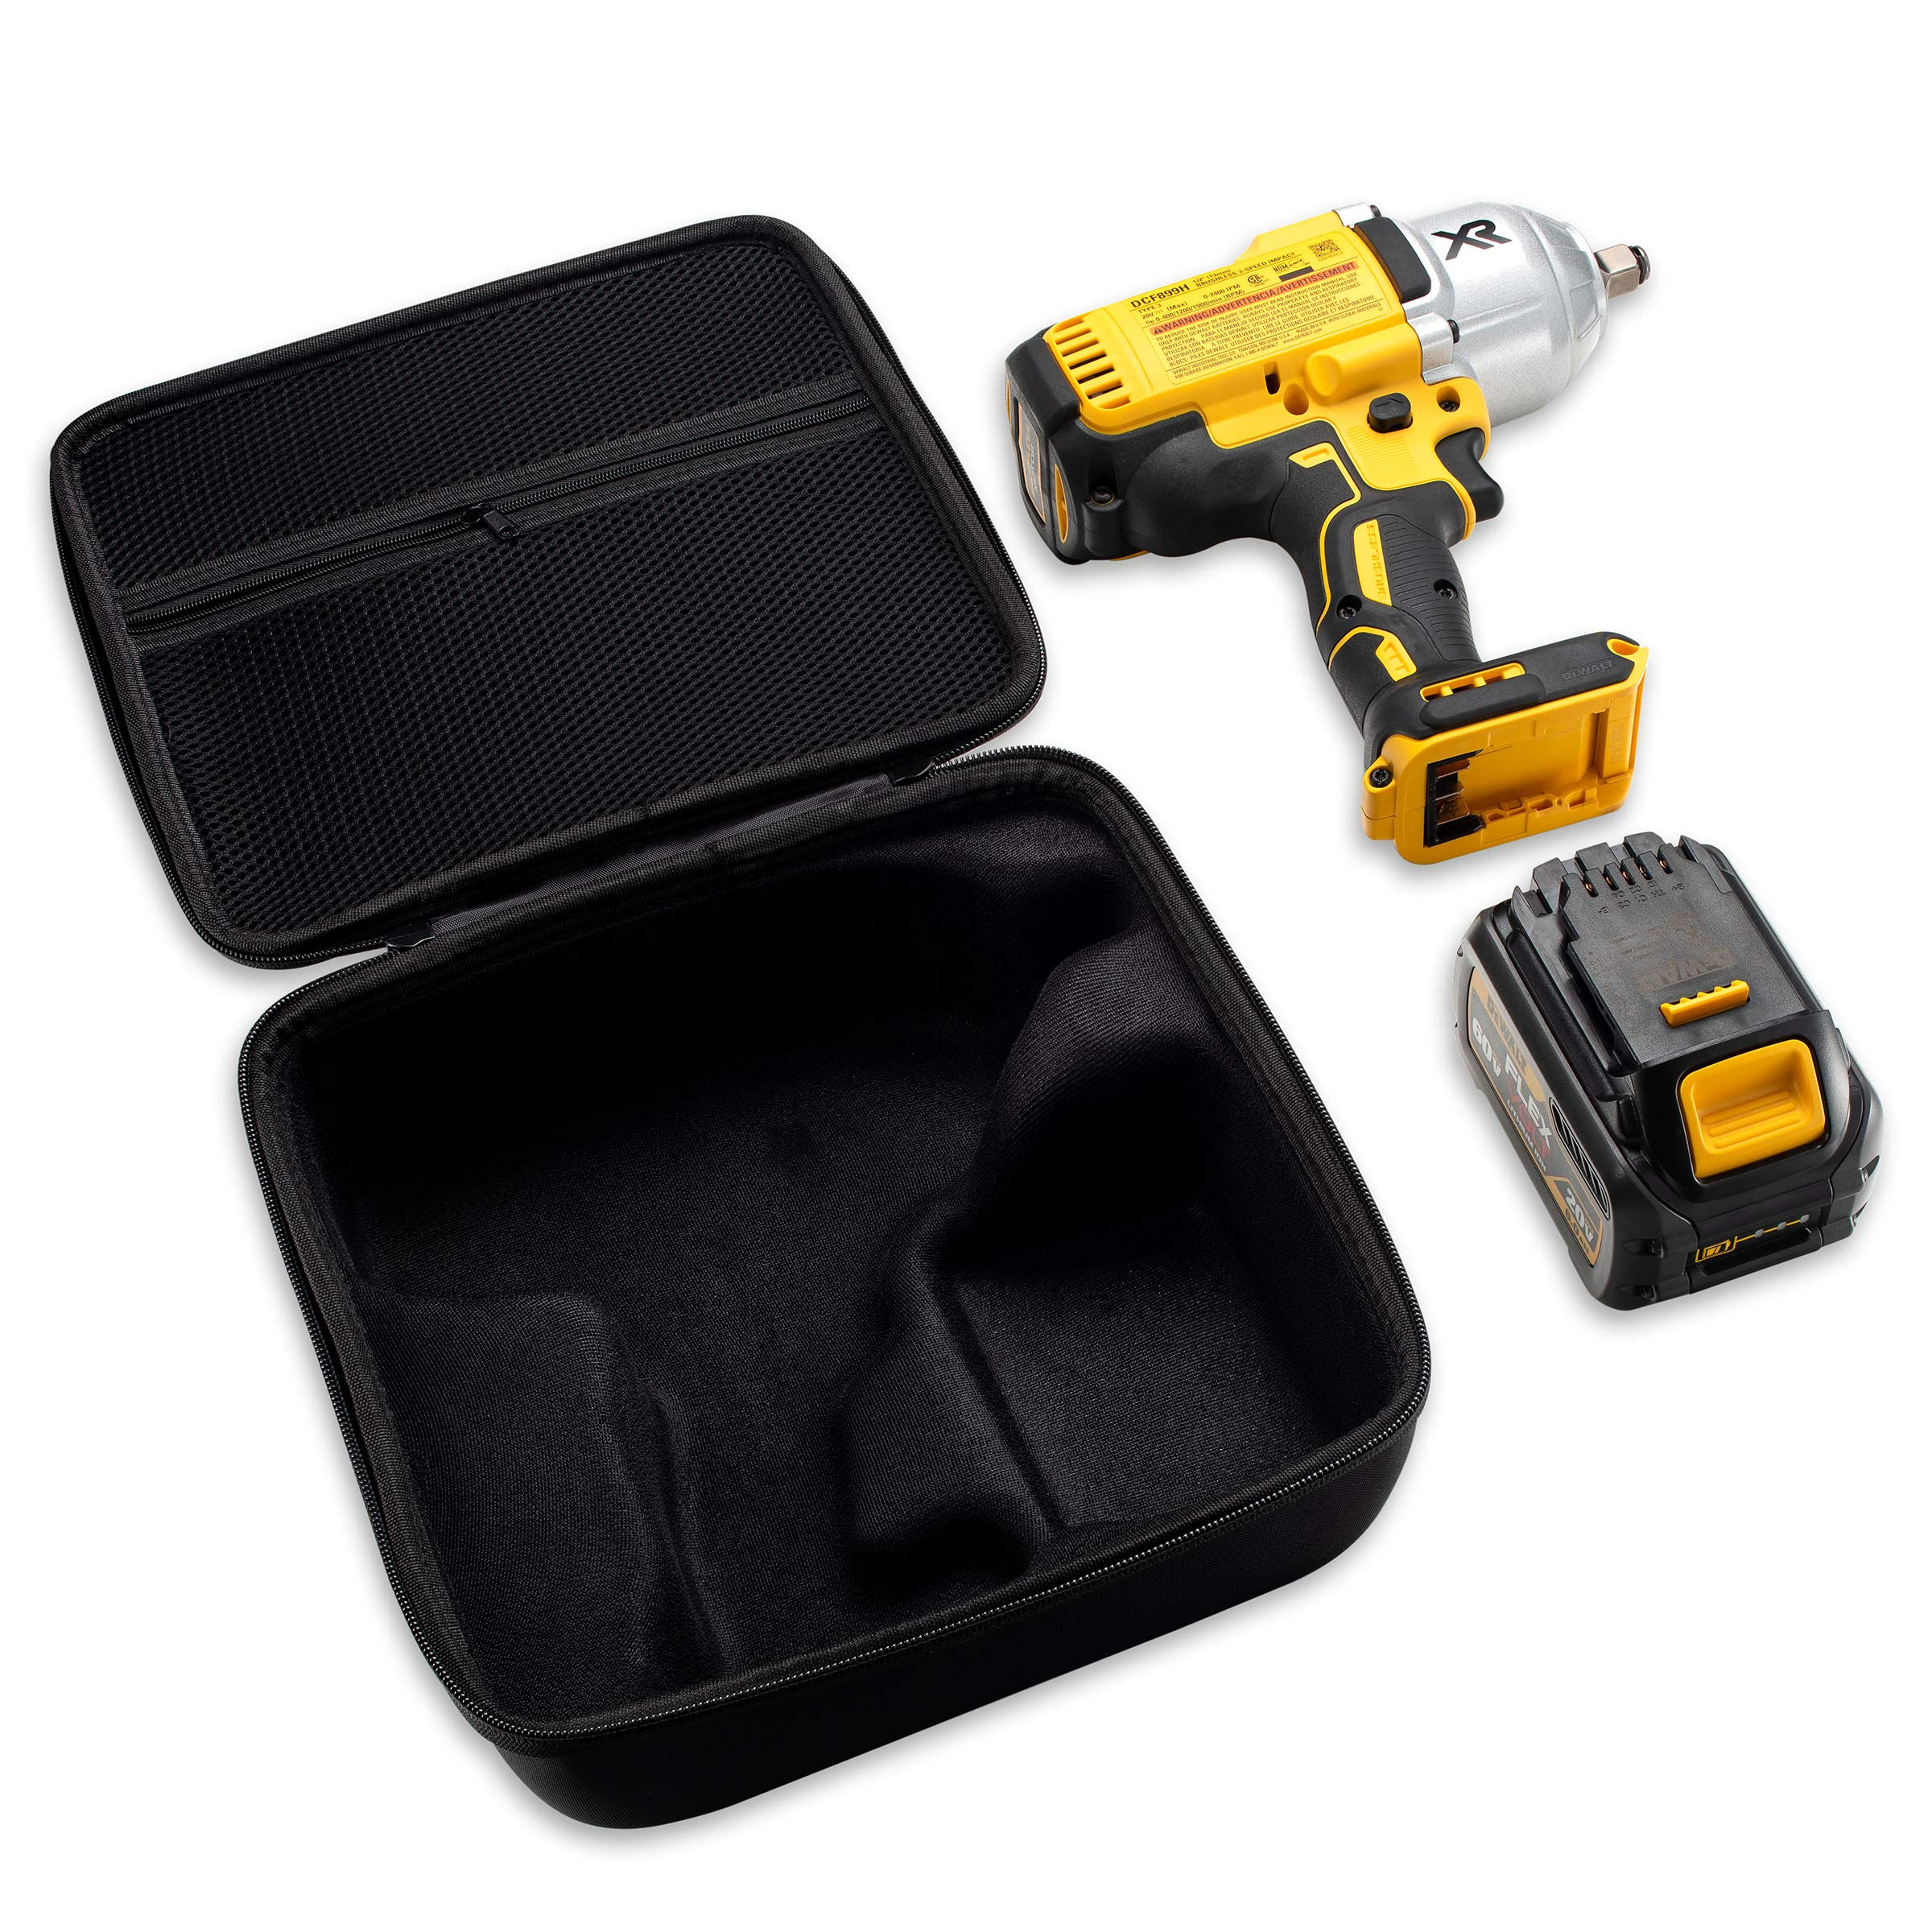 Caseling Hard Case Fits Dewalt DCF899HB / DCF899B 20V MAX XR Brushless High Torque 1/2'' Impact Wrench with Hog Ring Anvil & Battery Pack by caseling (Image #4)